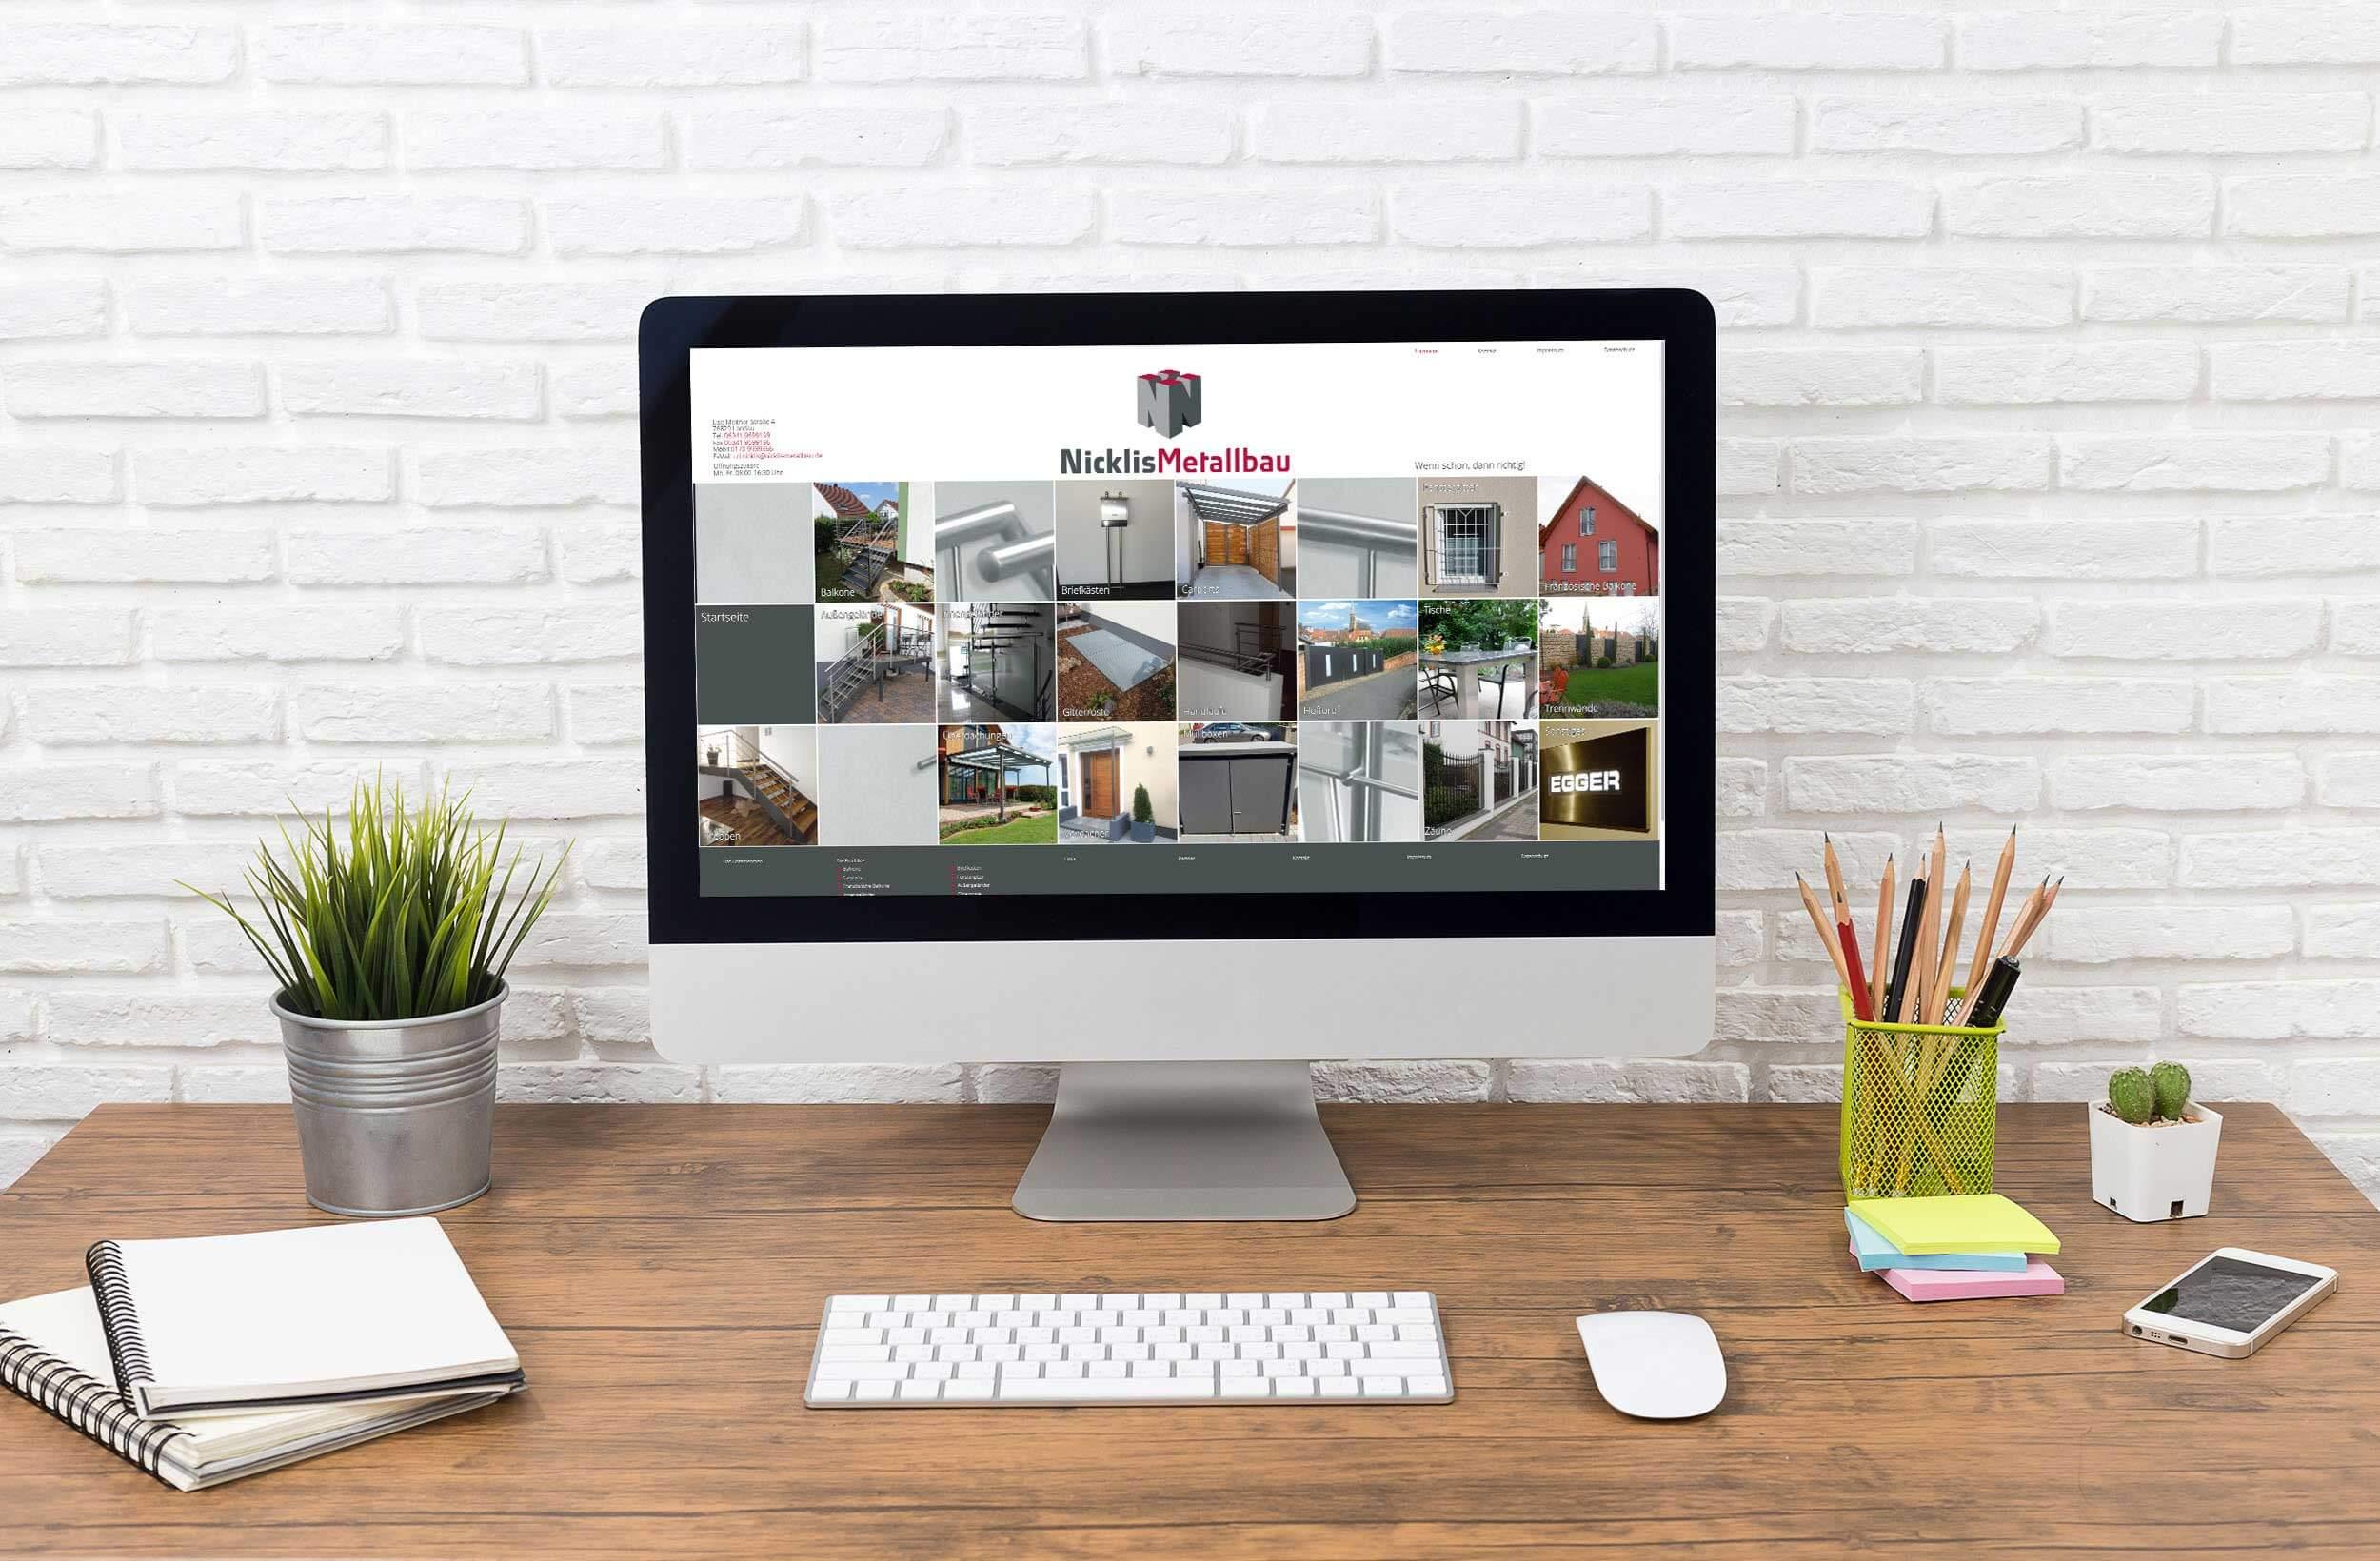 Nicklis Metallbau – Webdesign & -entwicklung